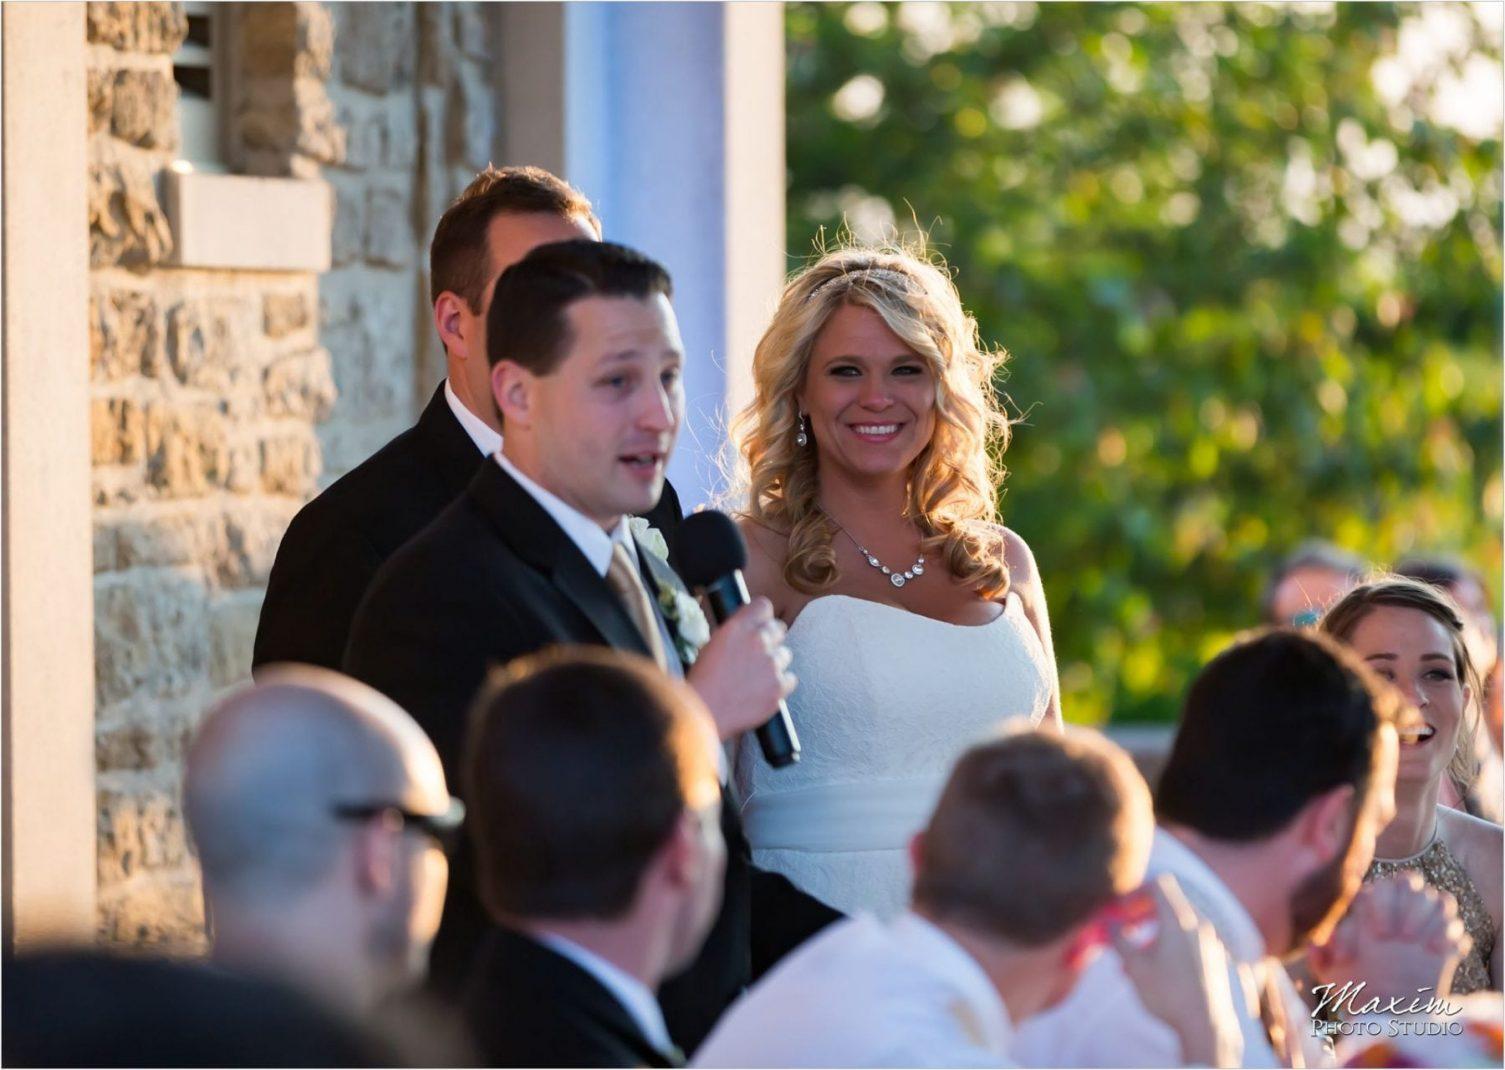 Ault Park Cincinnati Wedding Reception Toasts